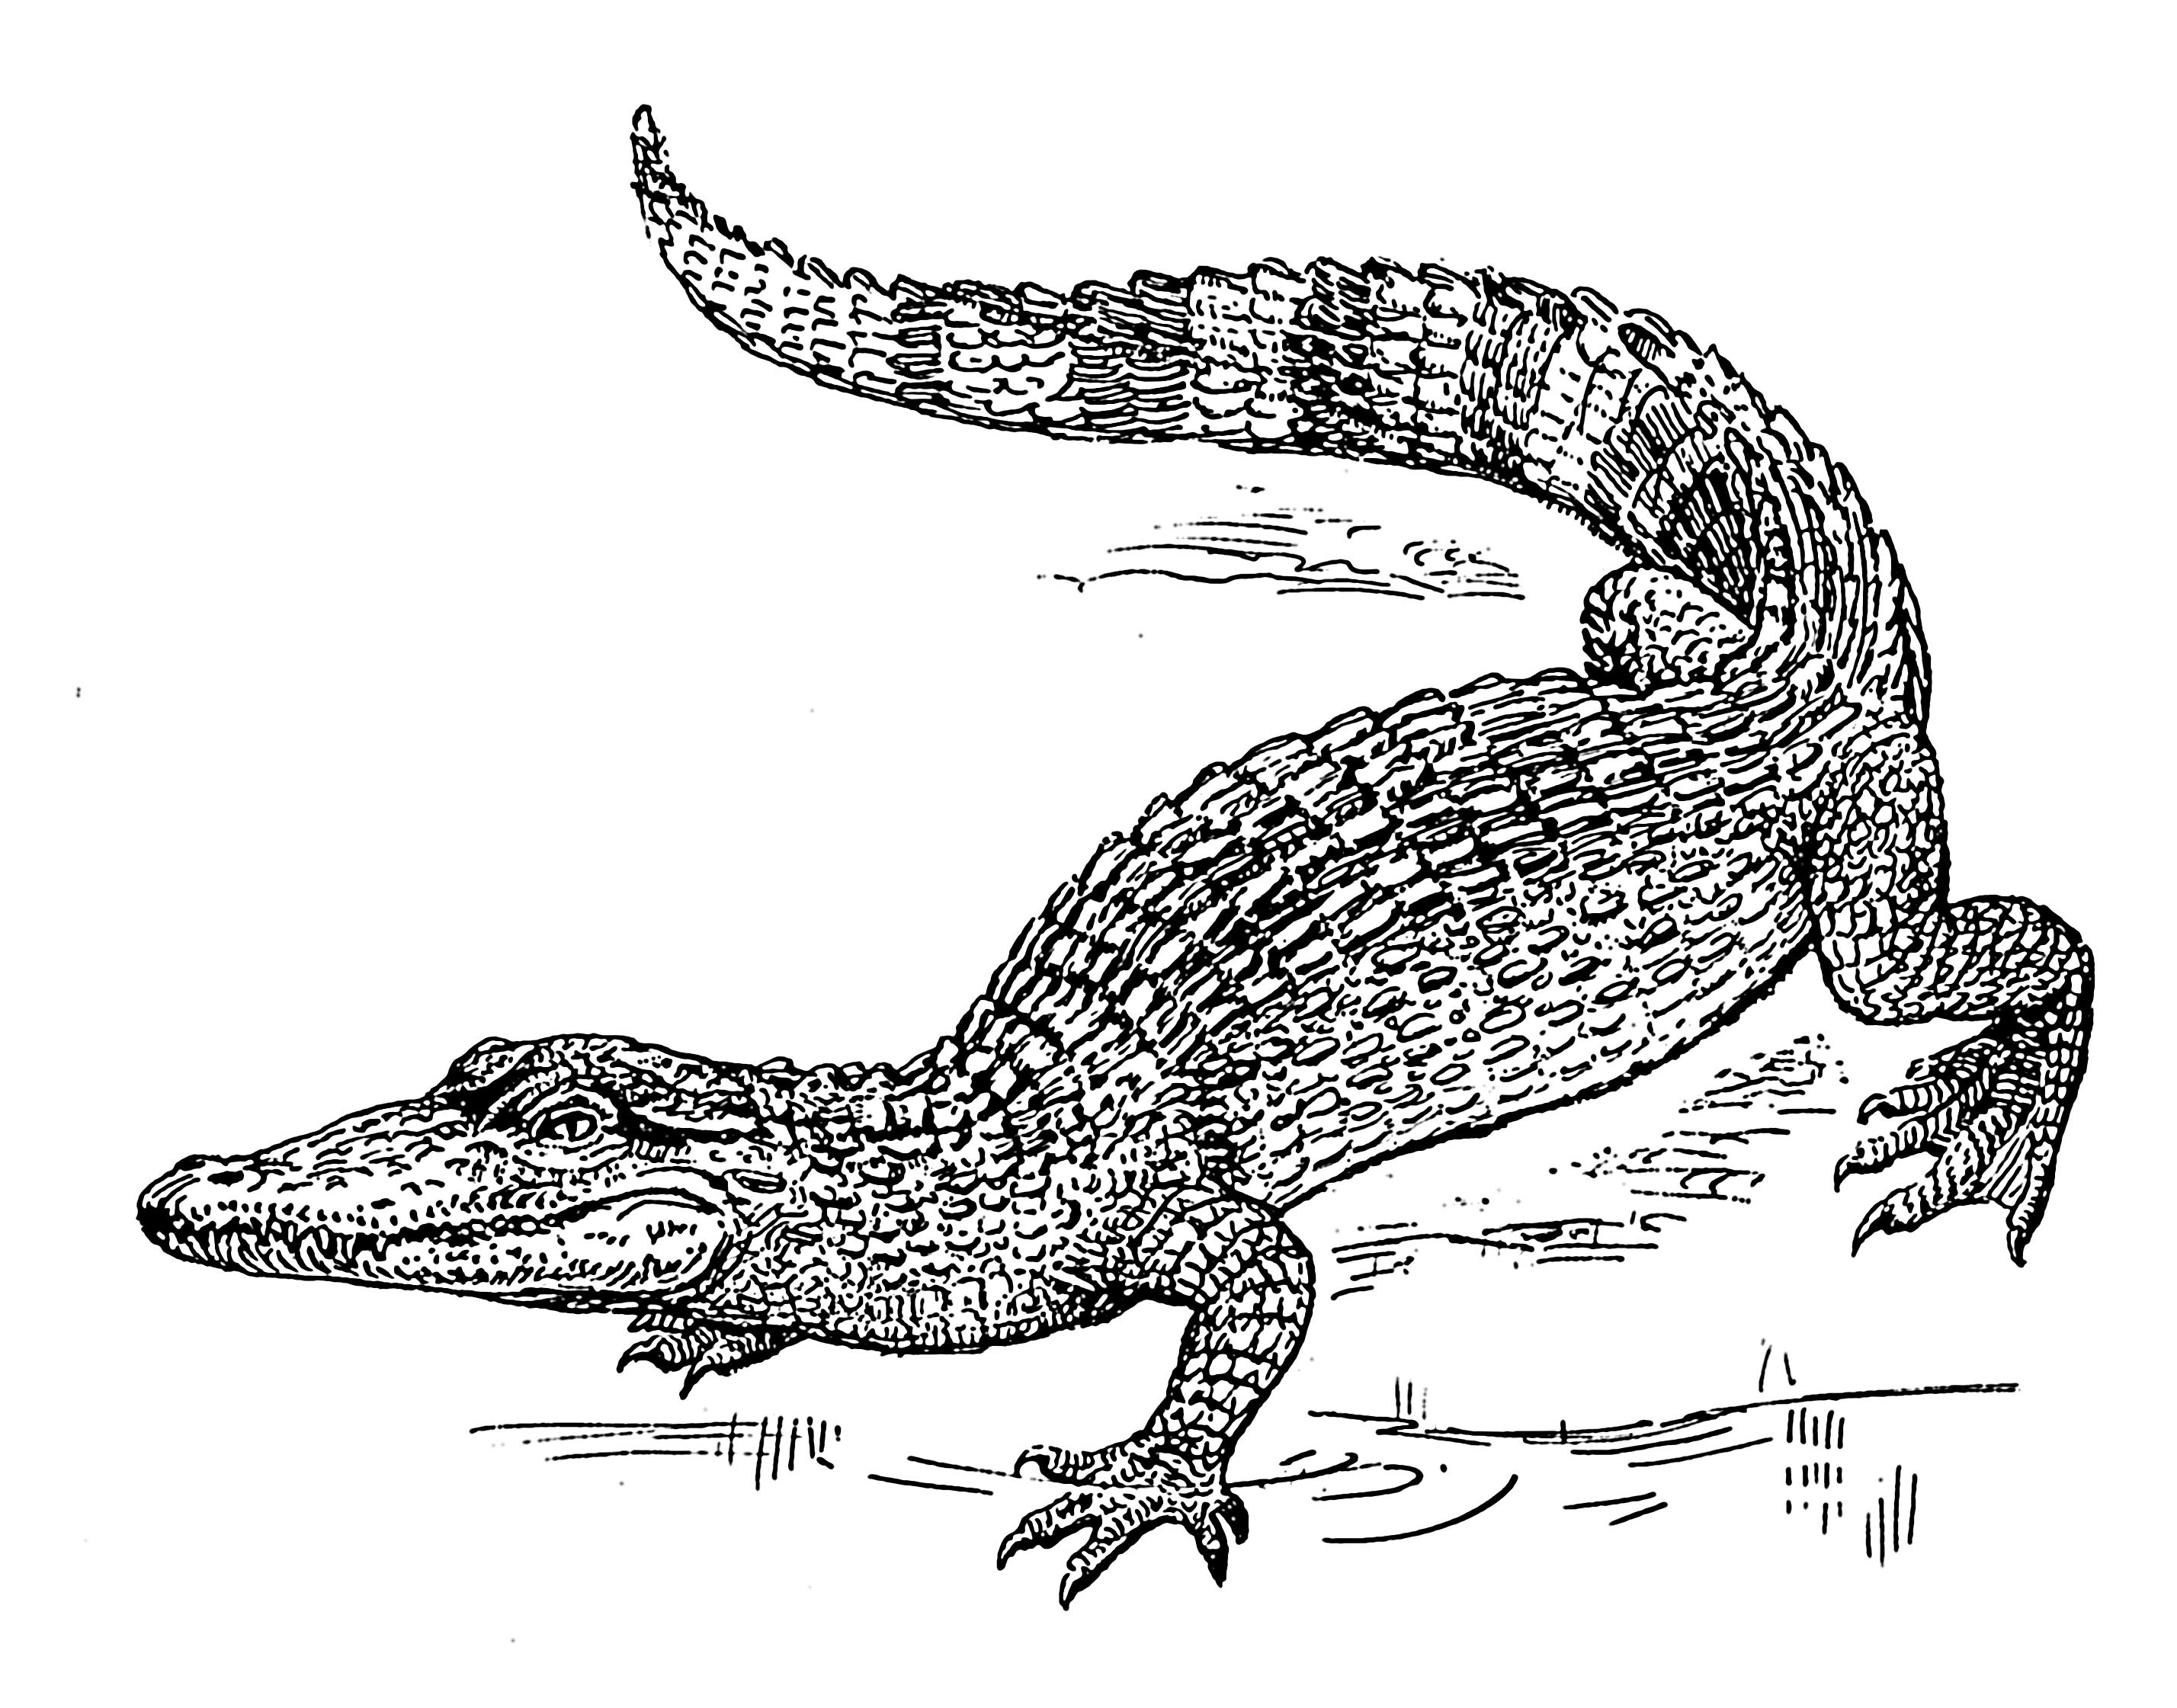 Photo De Crocodile A Imprimer - Greatestcoloringbook à Y Avait Des Crocodiles